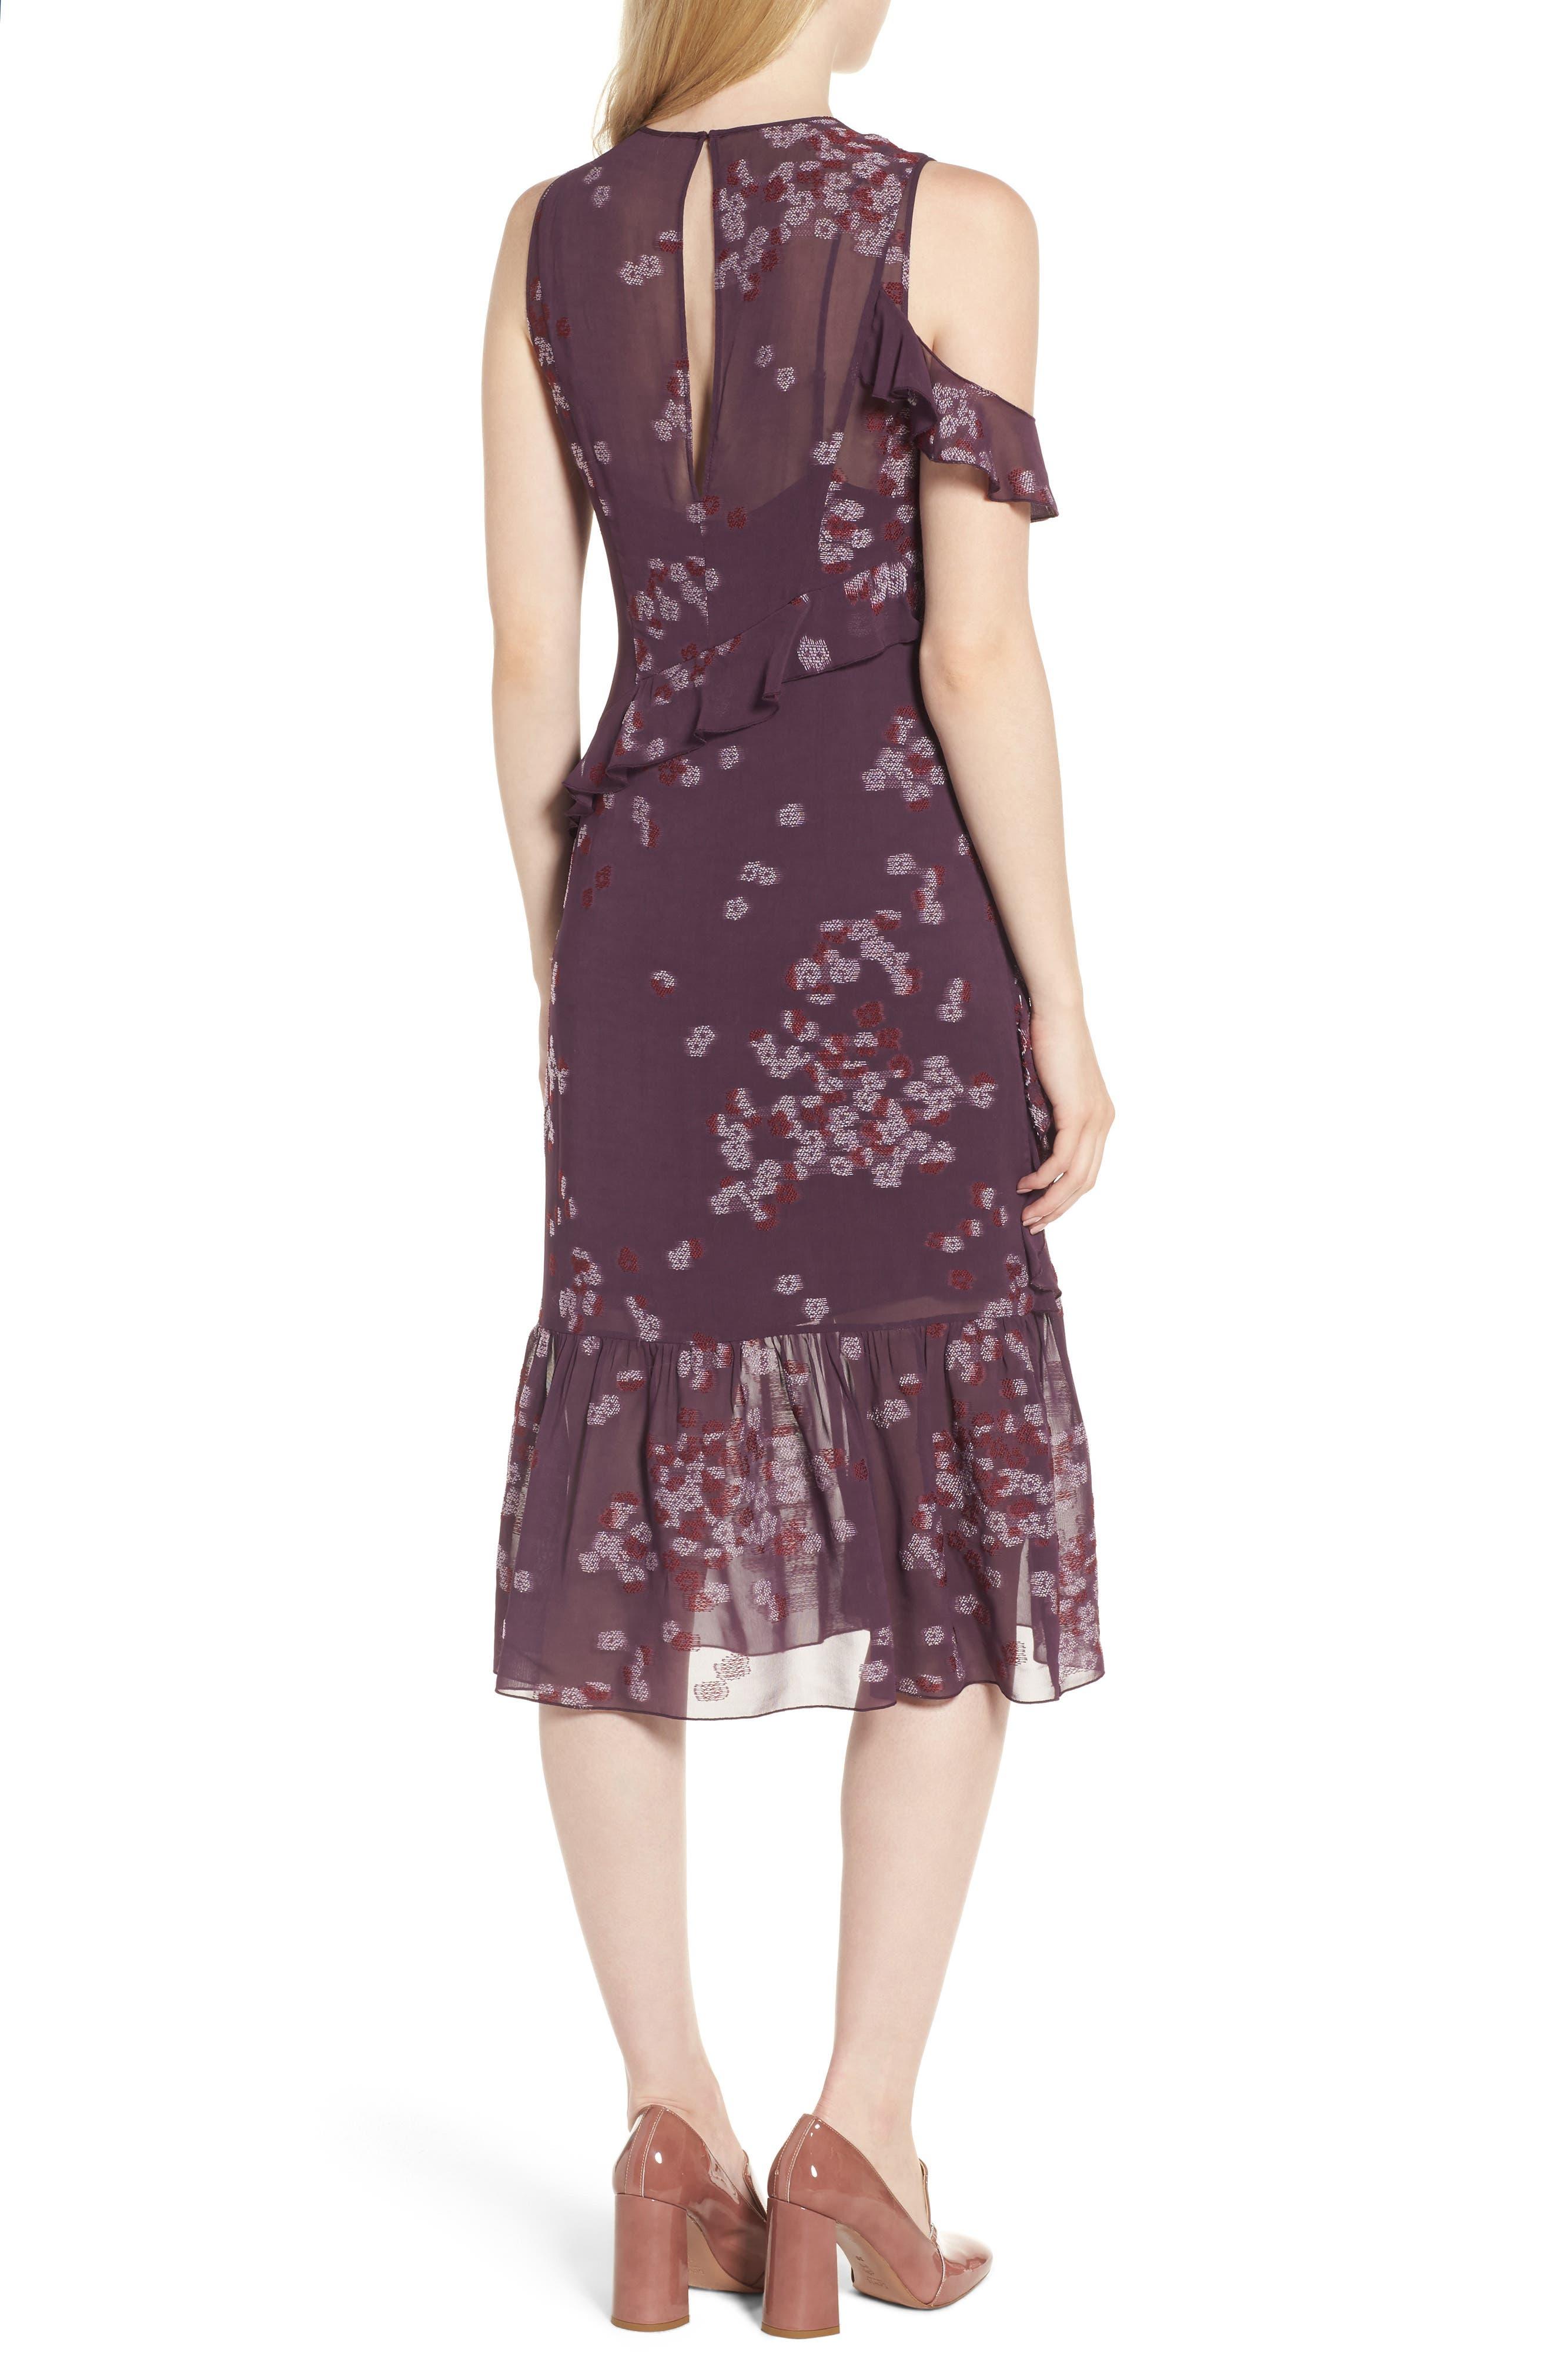 Jacquard Ruffle Dress,                             Alternate thumbnail 2, color,                             Purple Plum Scattered Floral